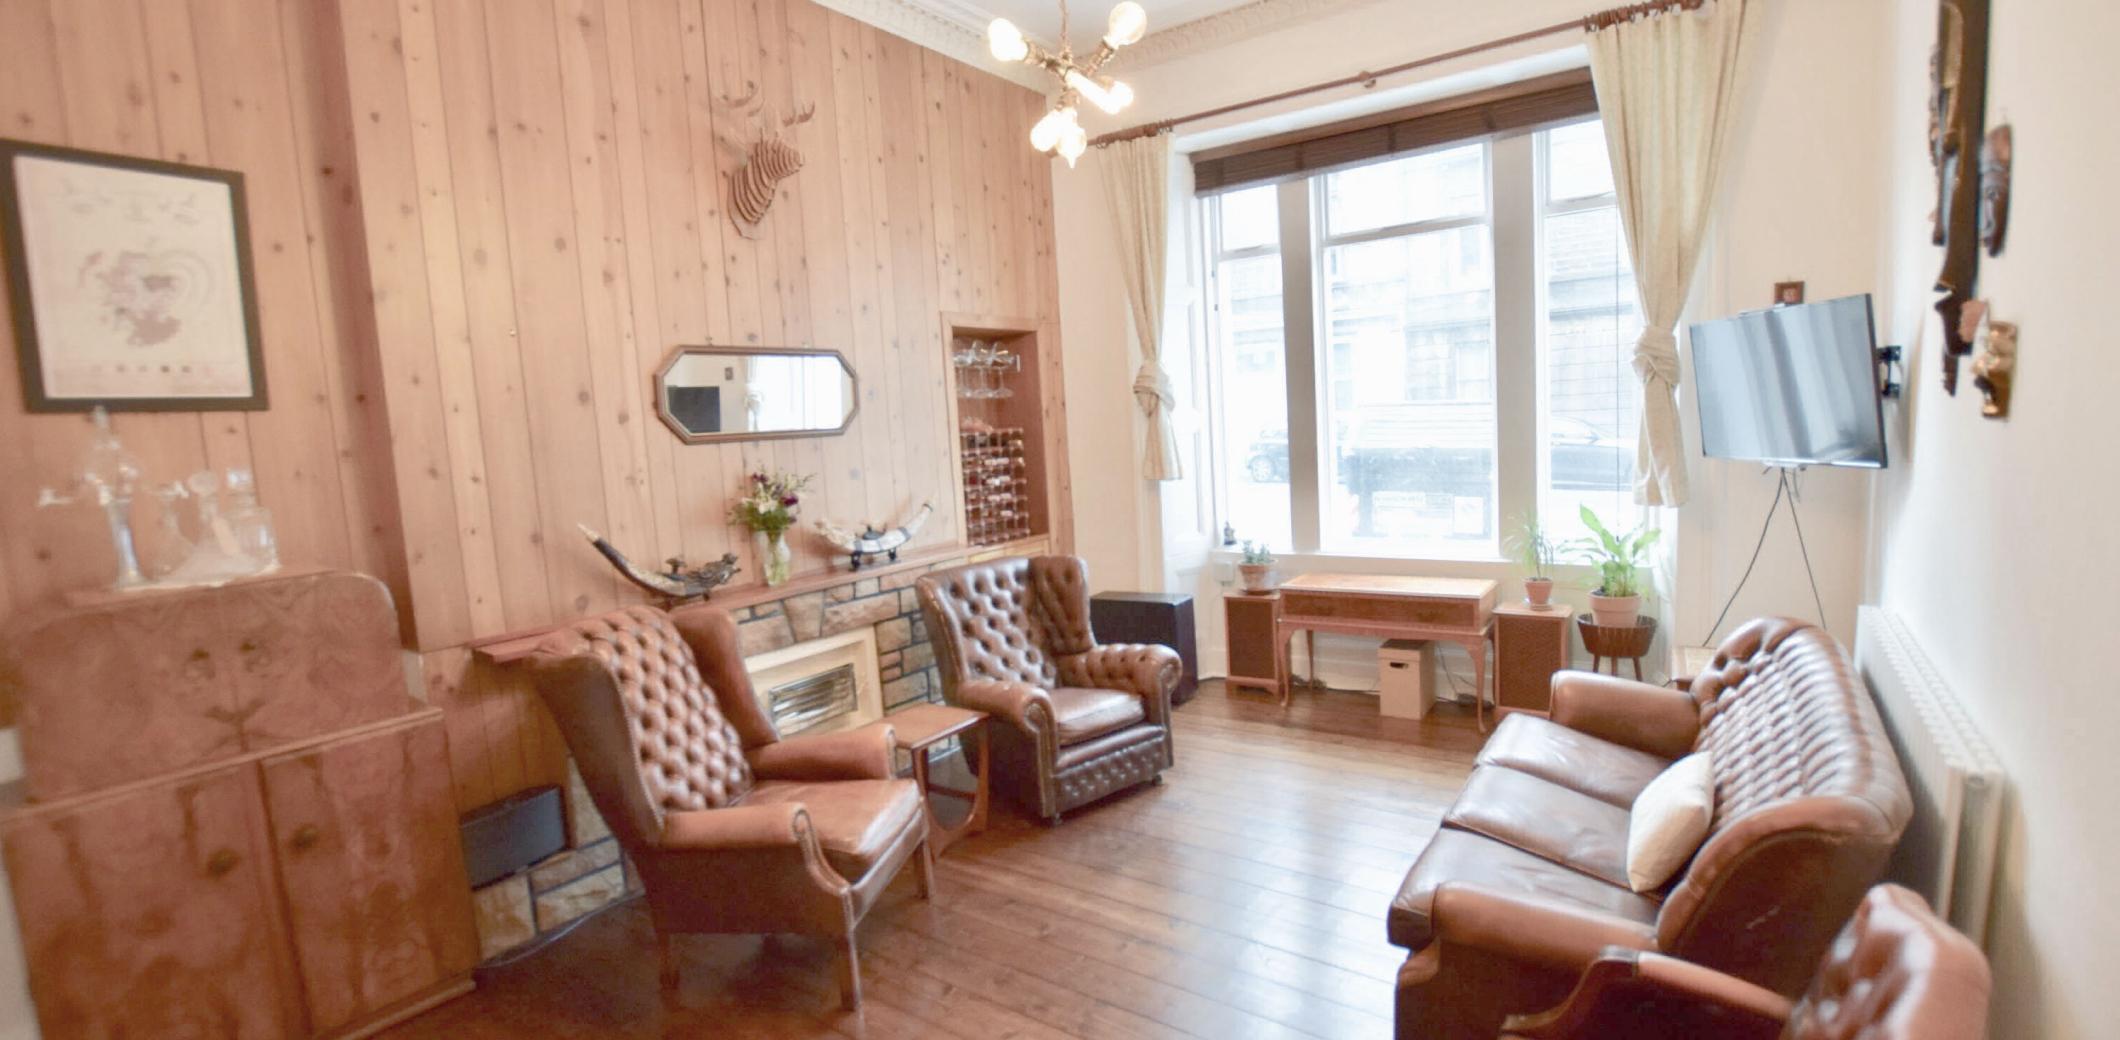 Room To Rent Edinburgh Salon